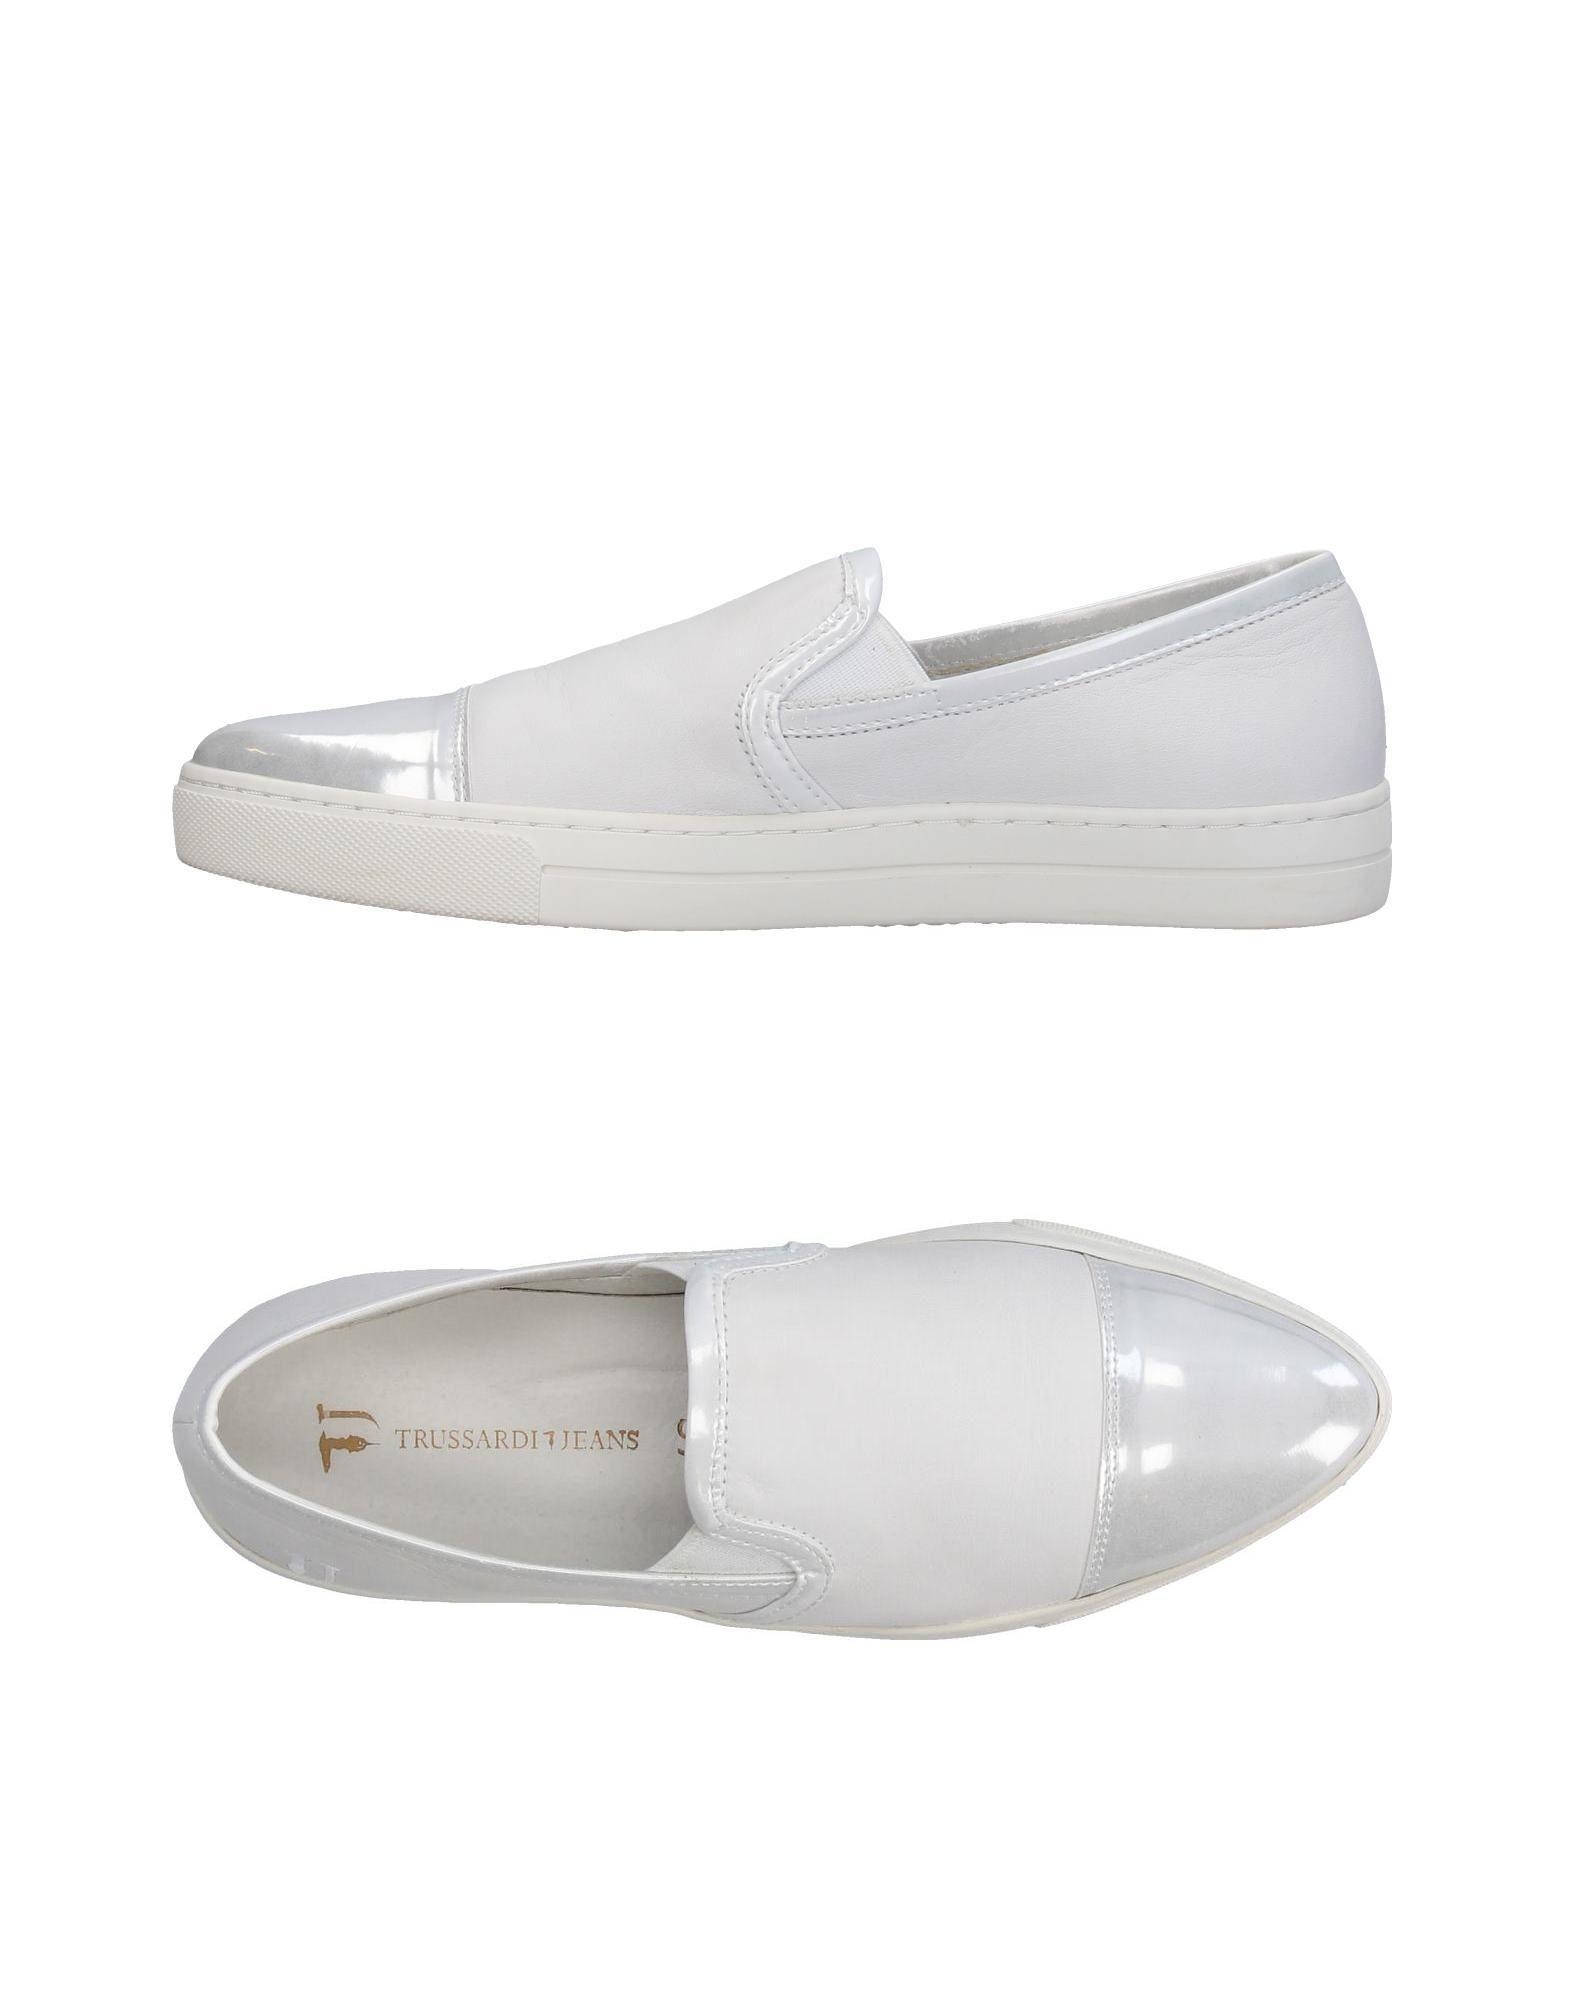 Trussardi Jeans Sneakers Damen  11400290PV Gute Qualität beliebte Schuhe